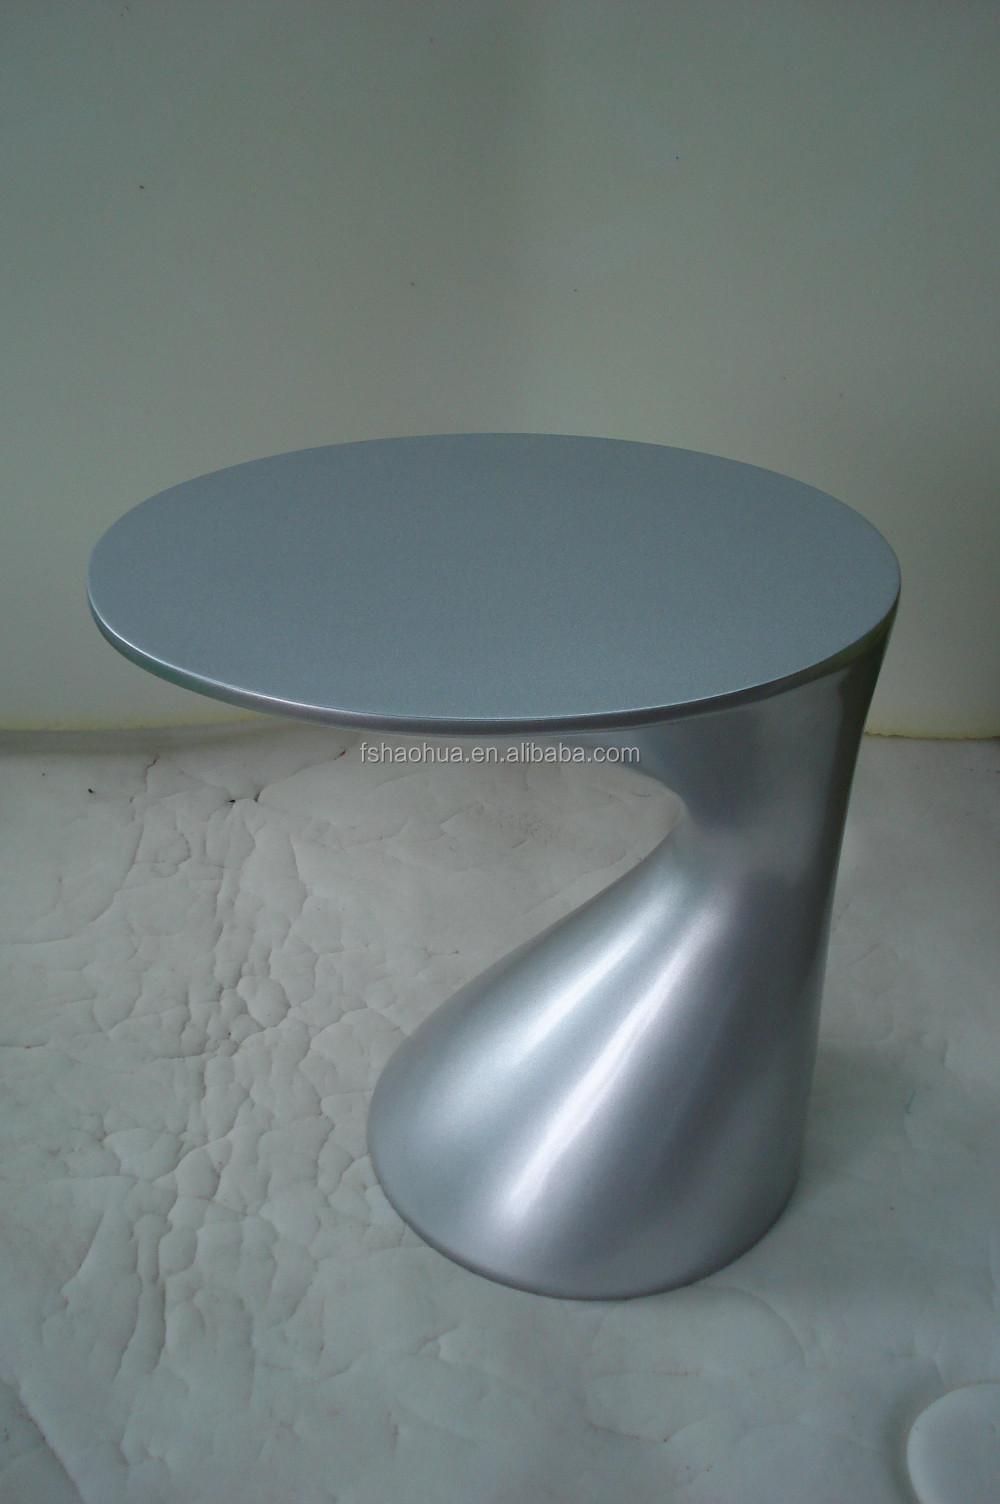 Zanotta tod beroemde ontwerp fiberglass bed side tafel salontafels ...